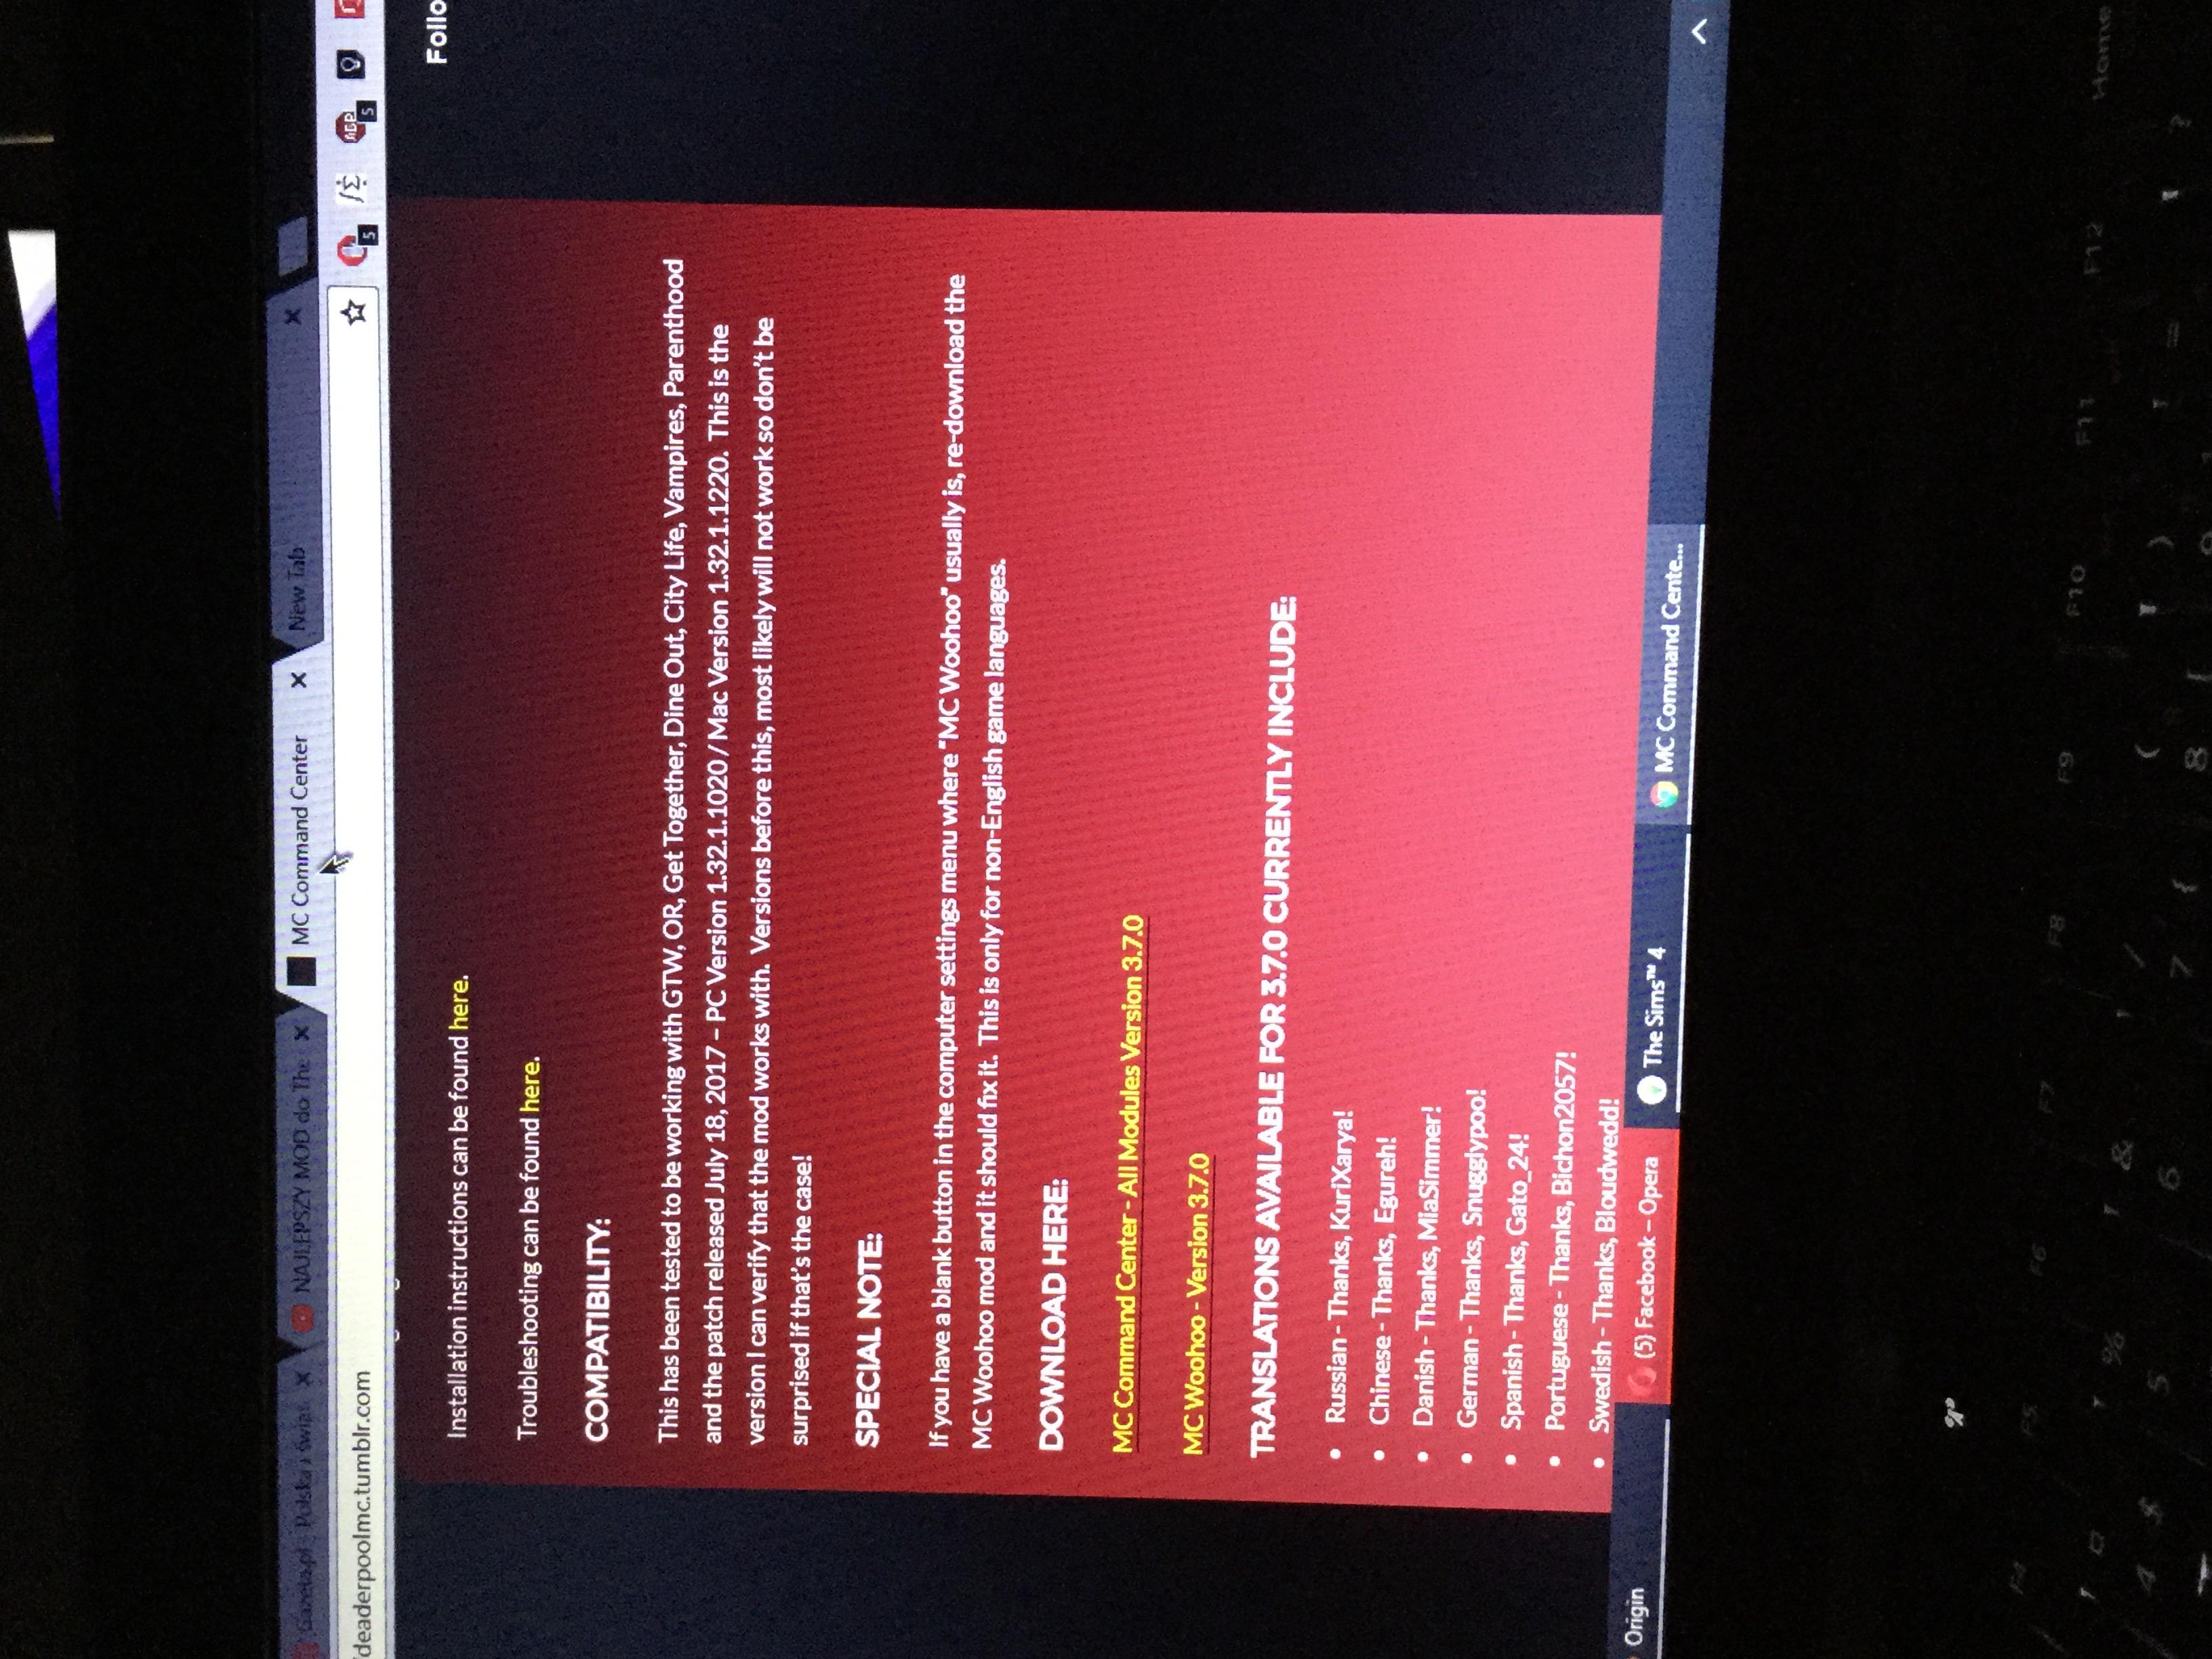 mc command mod sims 4 download